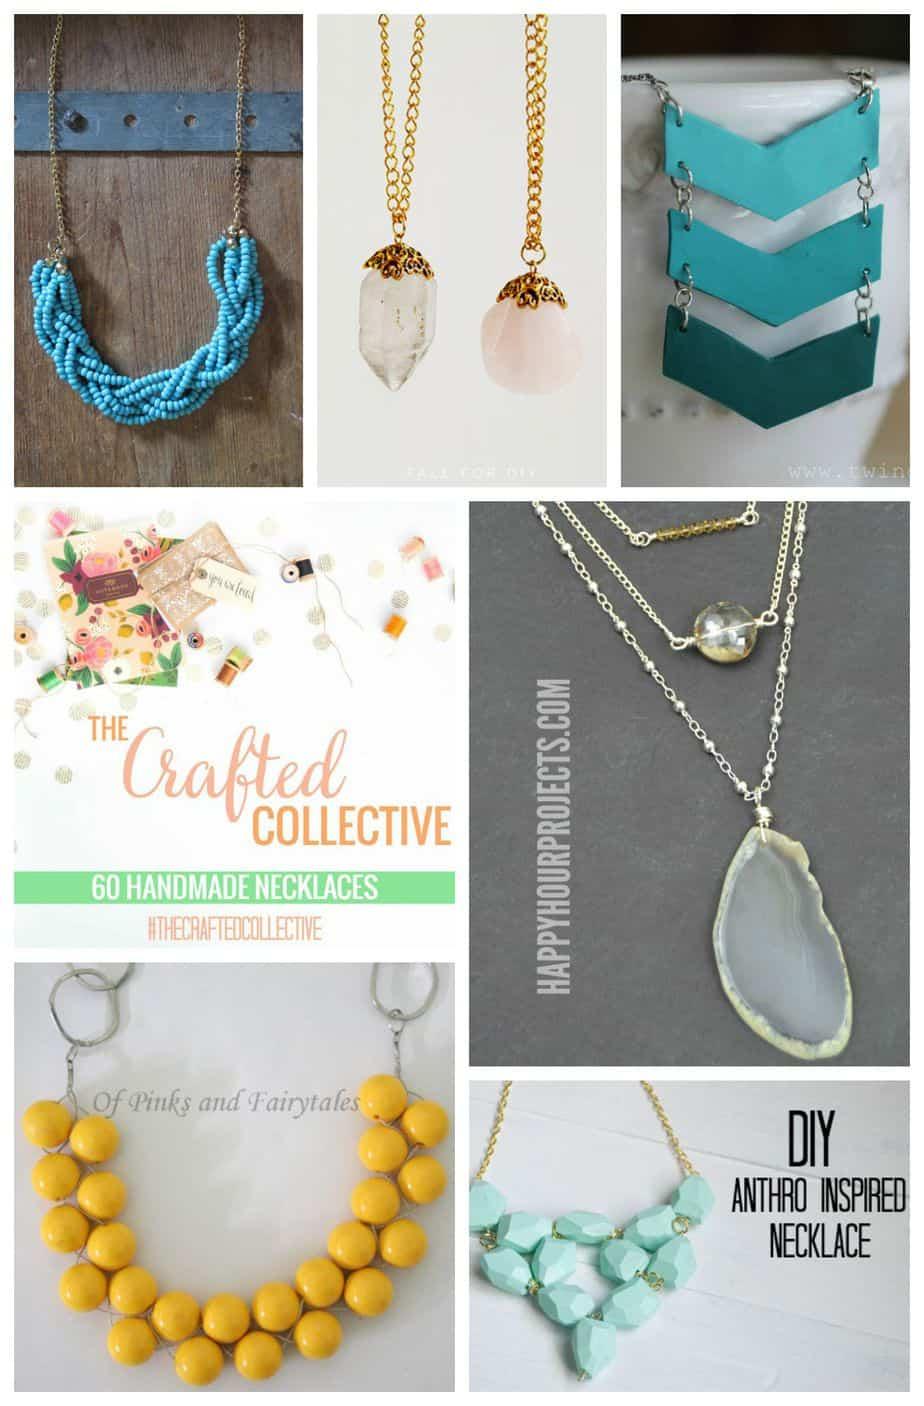 60 Handmade Necklaces